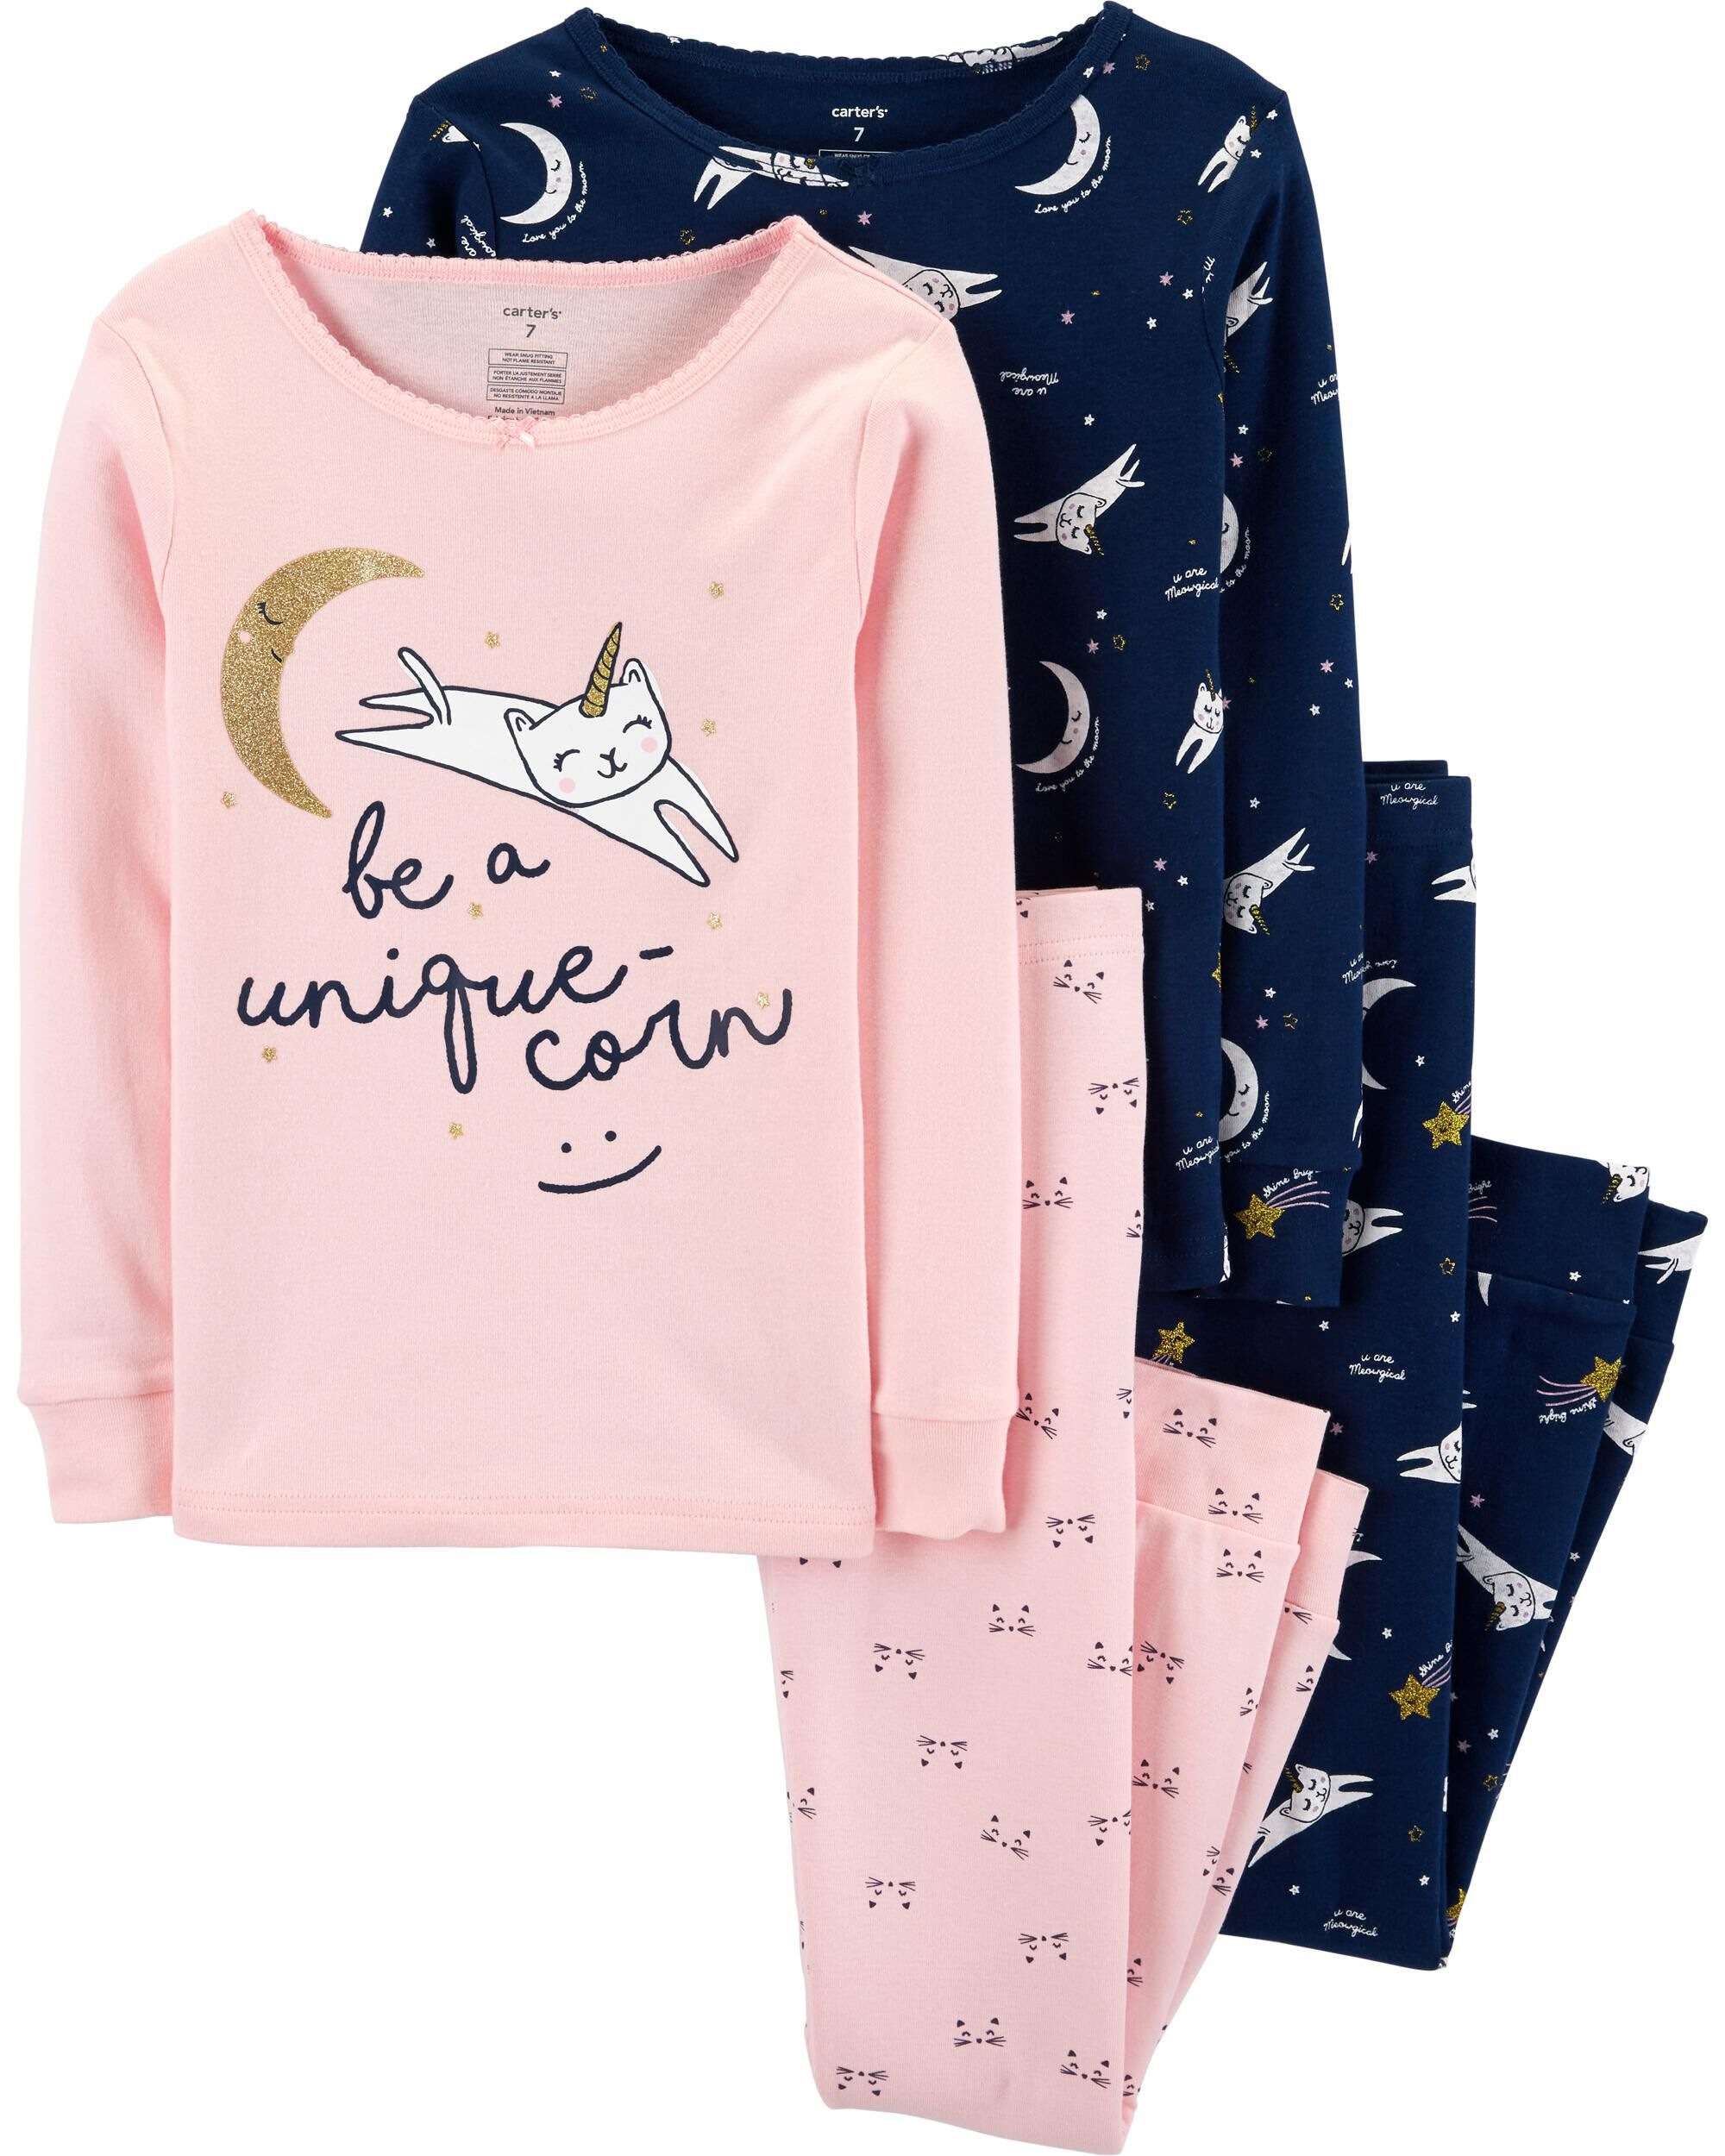 *DOORBUSTER* 4-Piece Unicorn Cat Snug Fit Cotton PJs